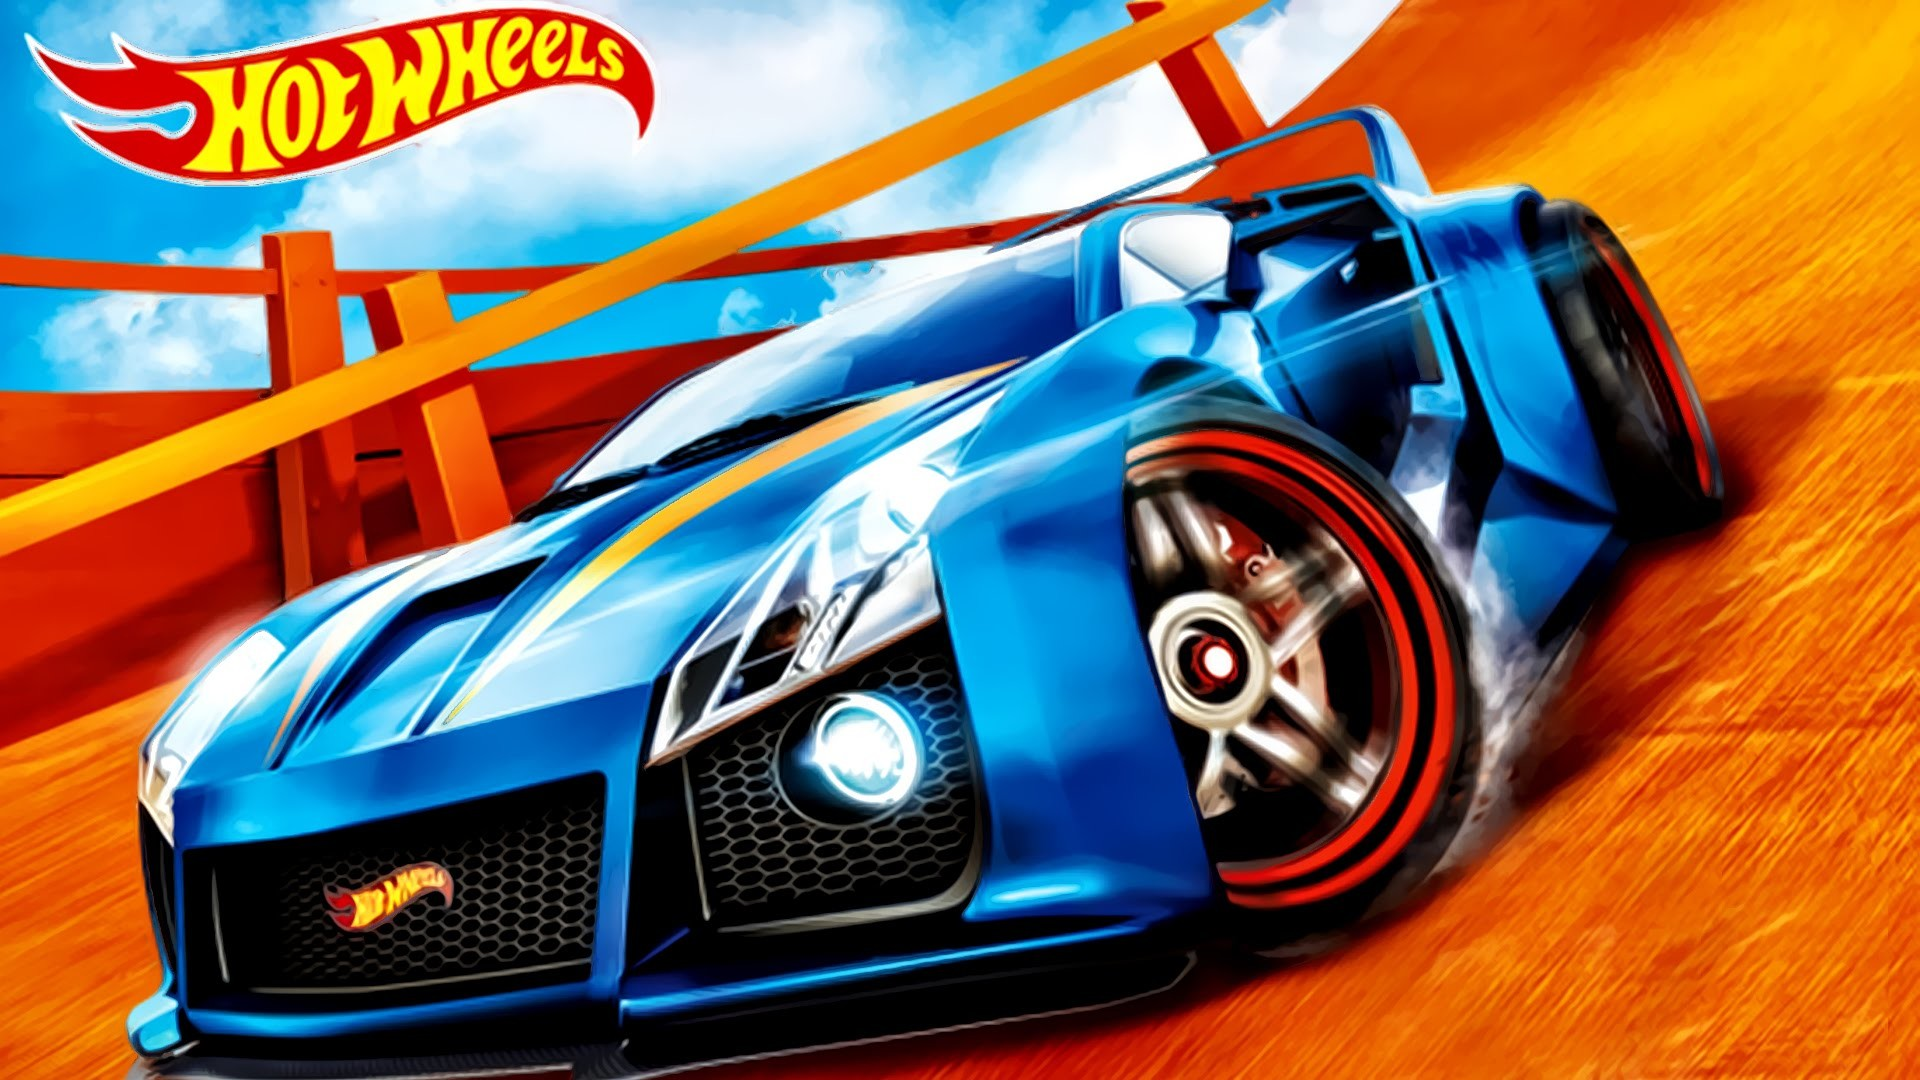 wheels wallpapers track stunt background games wiki 1080 1920 film fandom latest wikia